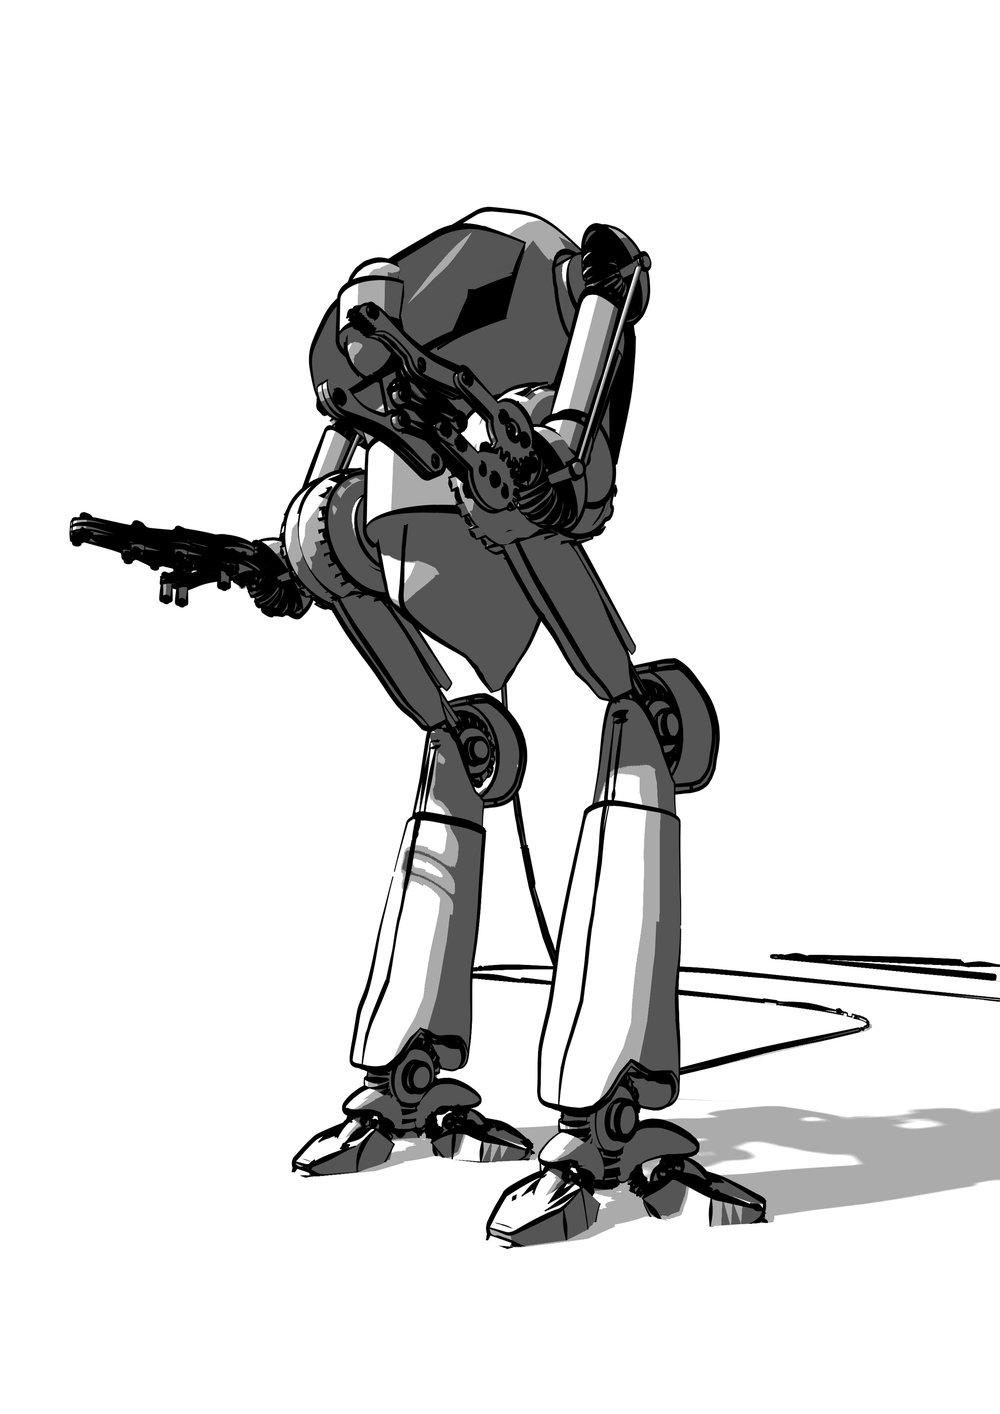 sketch01_all04.jpg